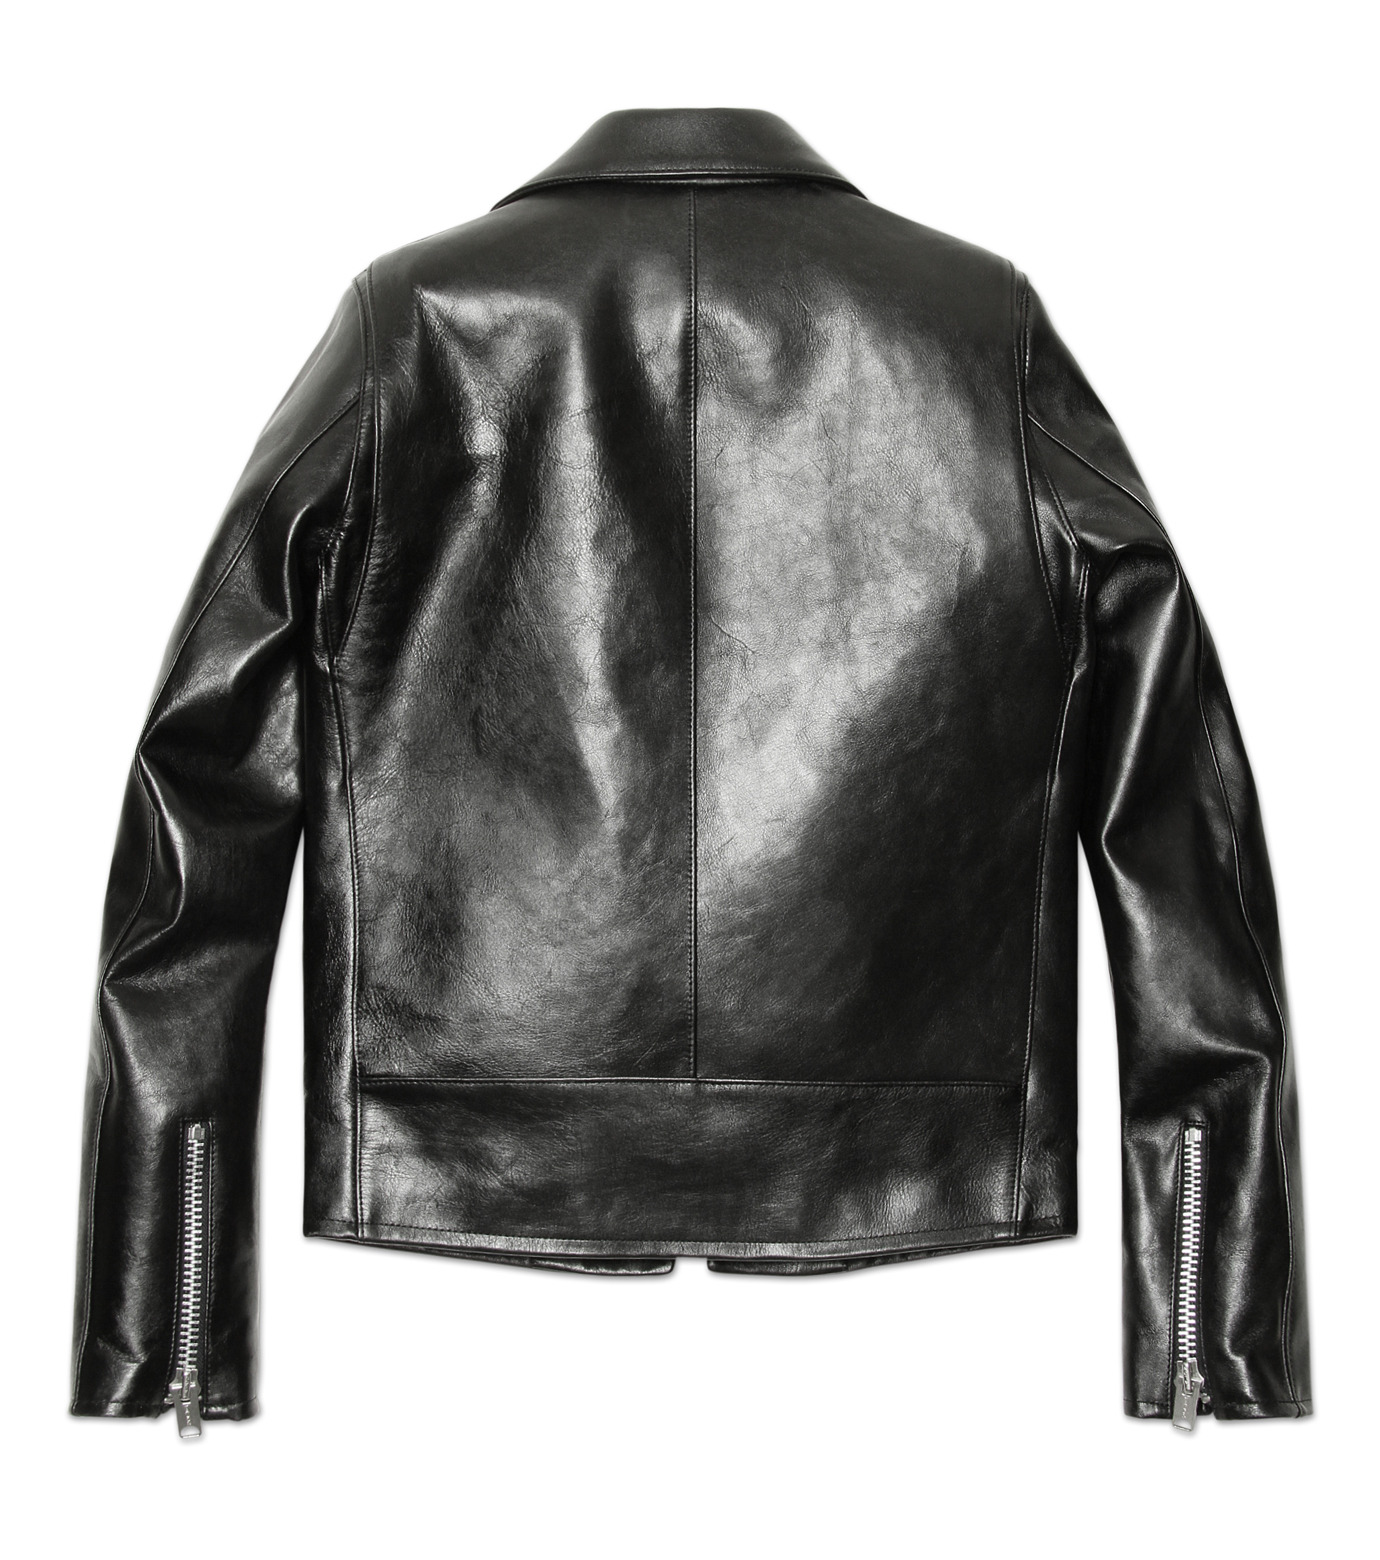 HL HEDDIE LOVU(エイチエル・エディールーヴ)のHL Riders S JK-BLACK(ジャケット/jacket)-17S94002-13 拡大詳細画像2